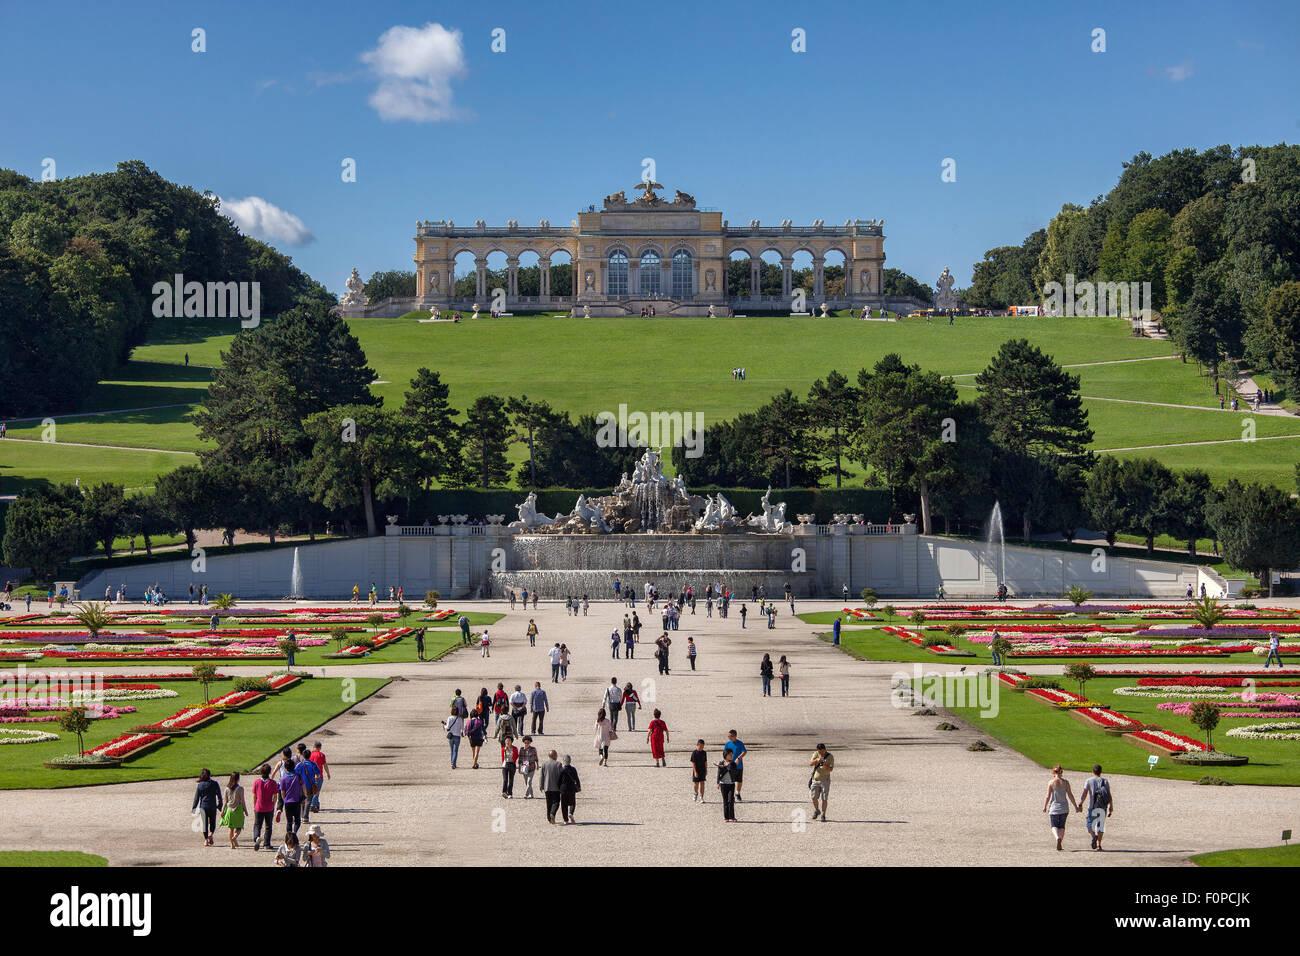 Gloriette Gebäude im Schlosspark Schloss Schoenbrunn Palast, UNESCO Weltkulturerbe, Wien, Austria, Europe Stockfoto